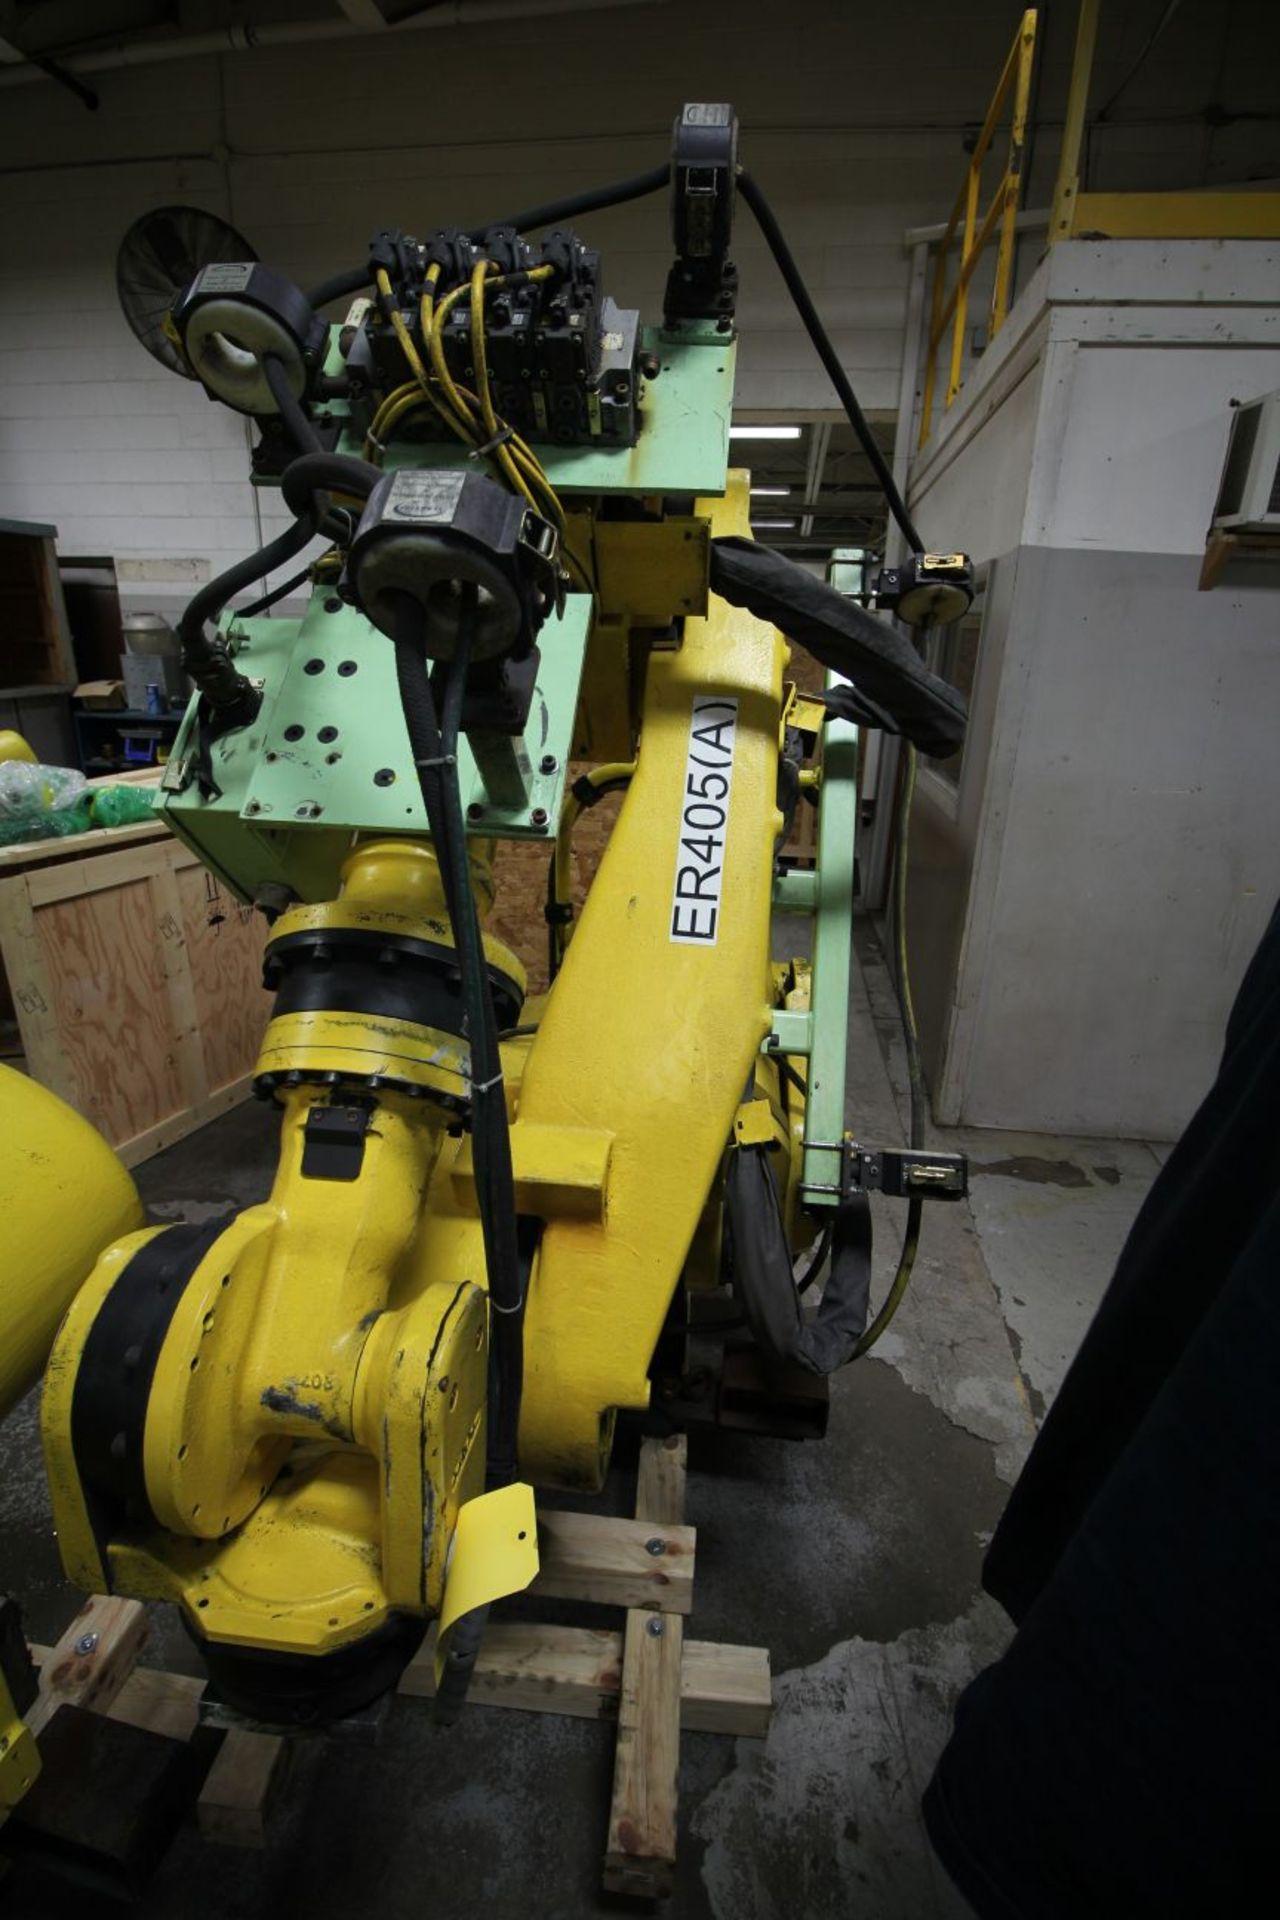 Lot 44 - FANUC ROBOT R-2000iA/200R WTIH R-J3iB CONTROLS, TEACH & CABLES, YEAR 2002, SN 55655